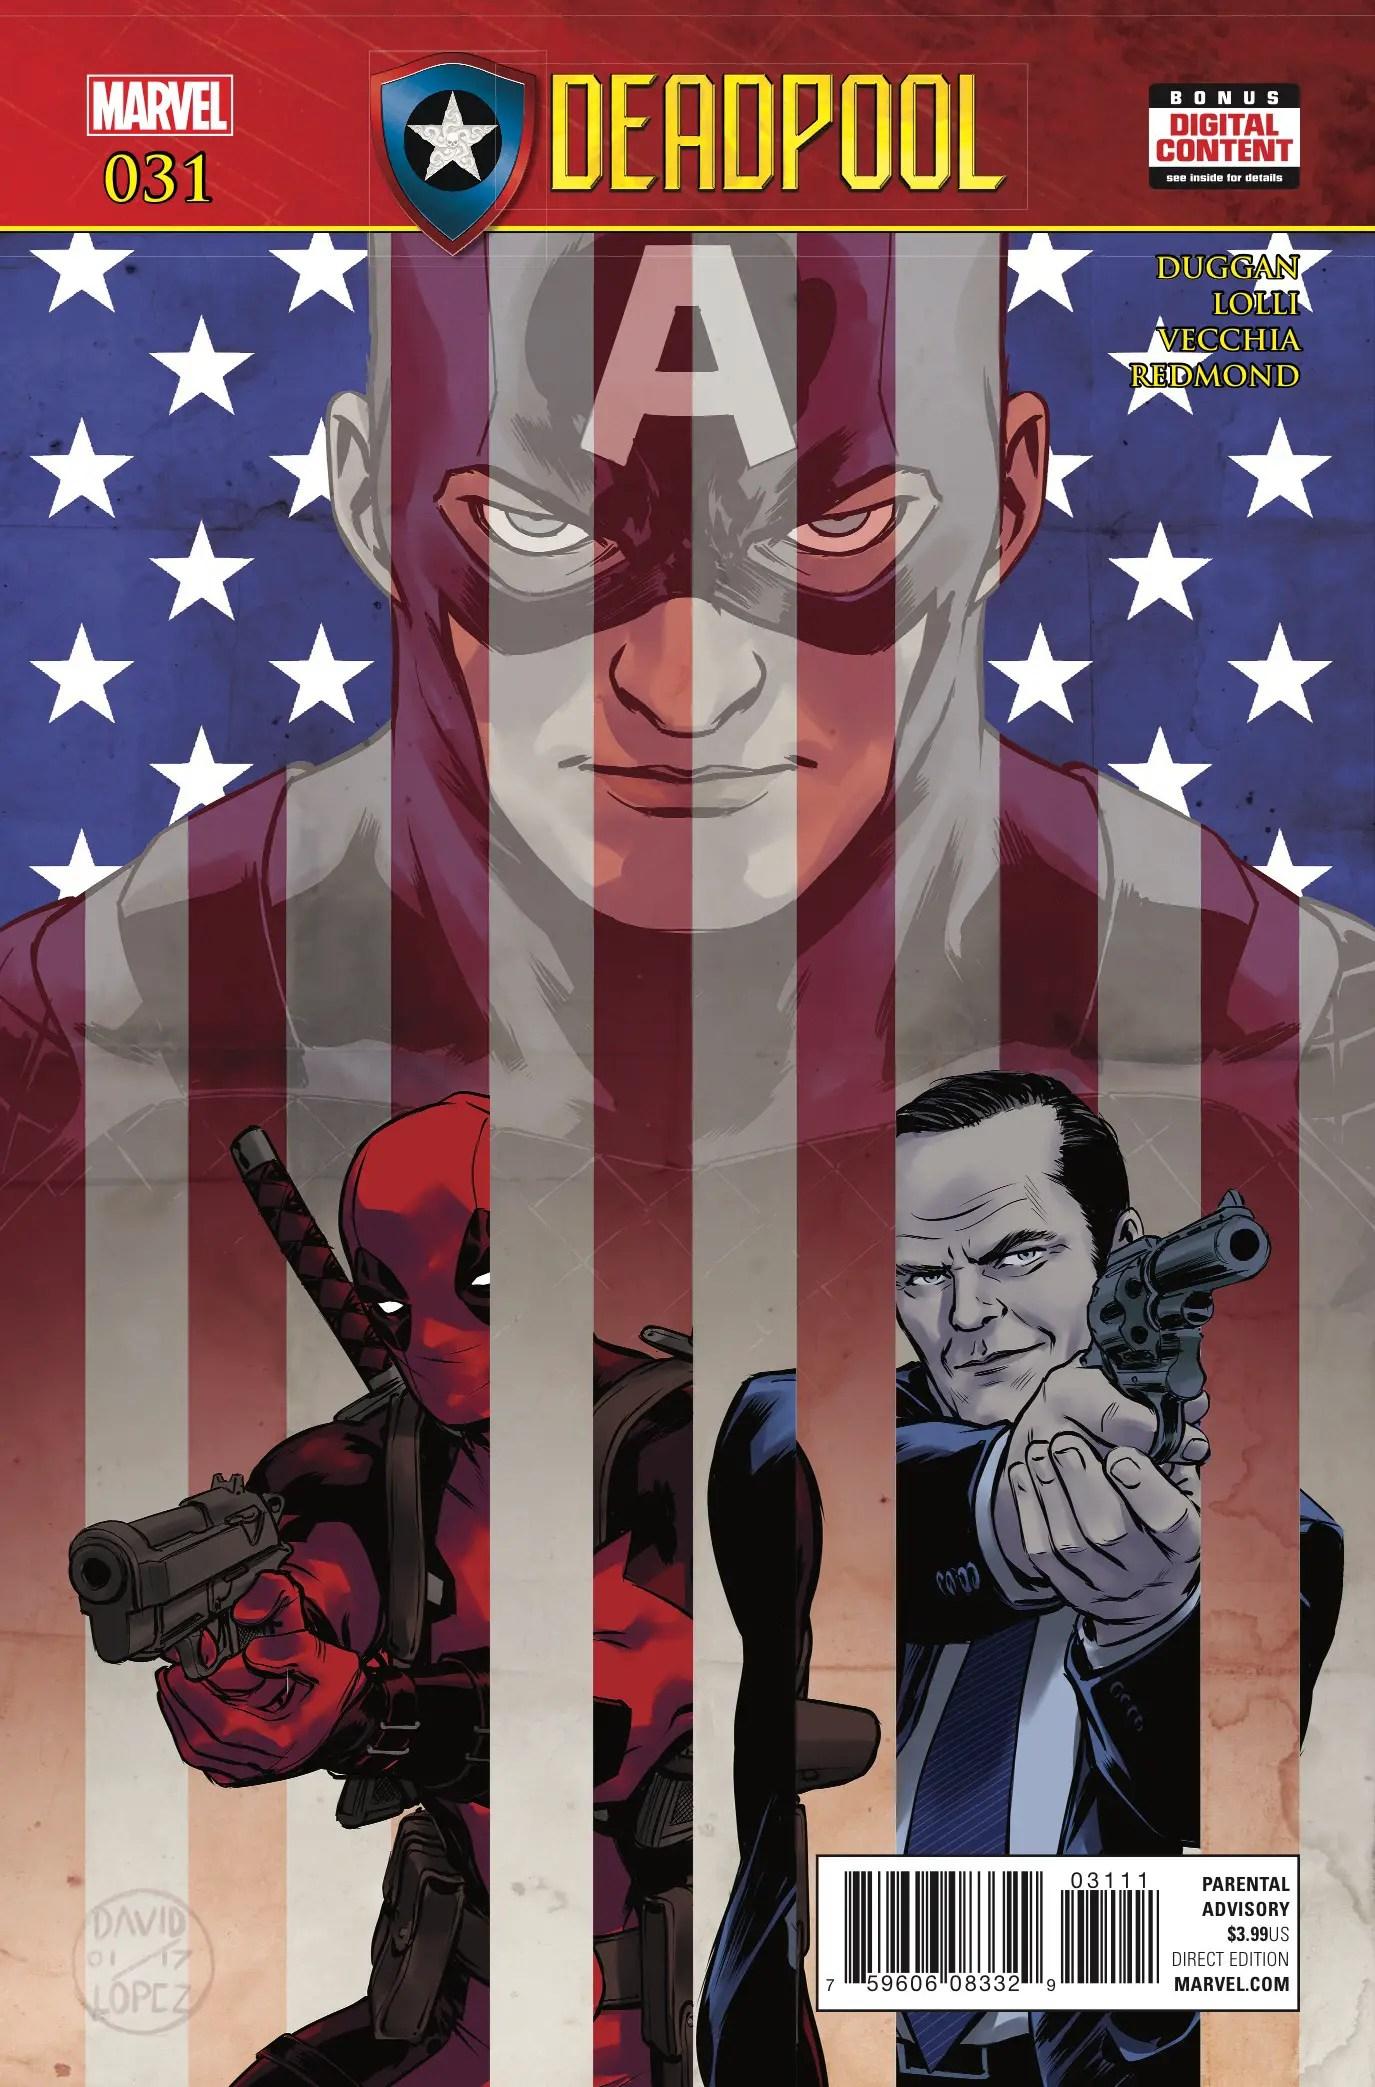 Deadpool #31 Review